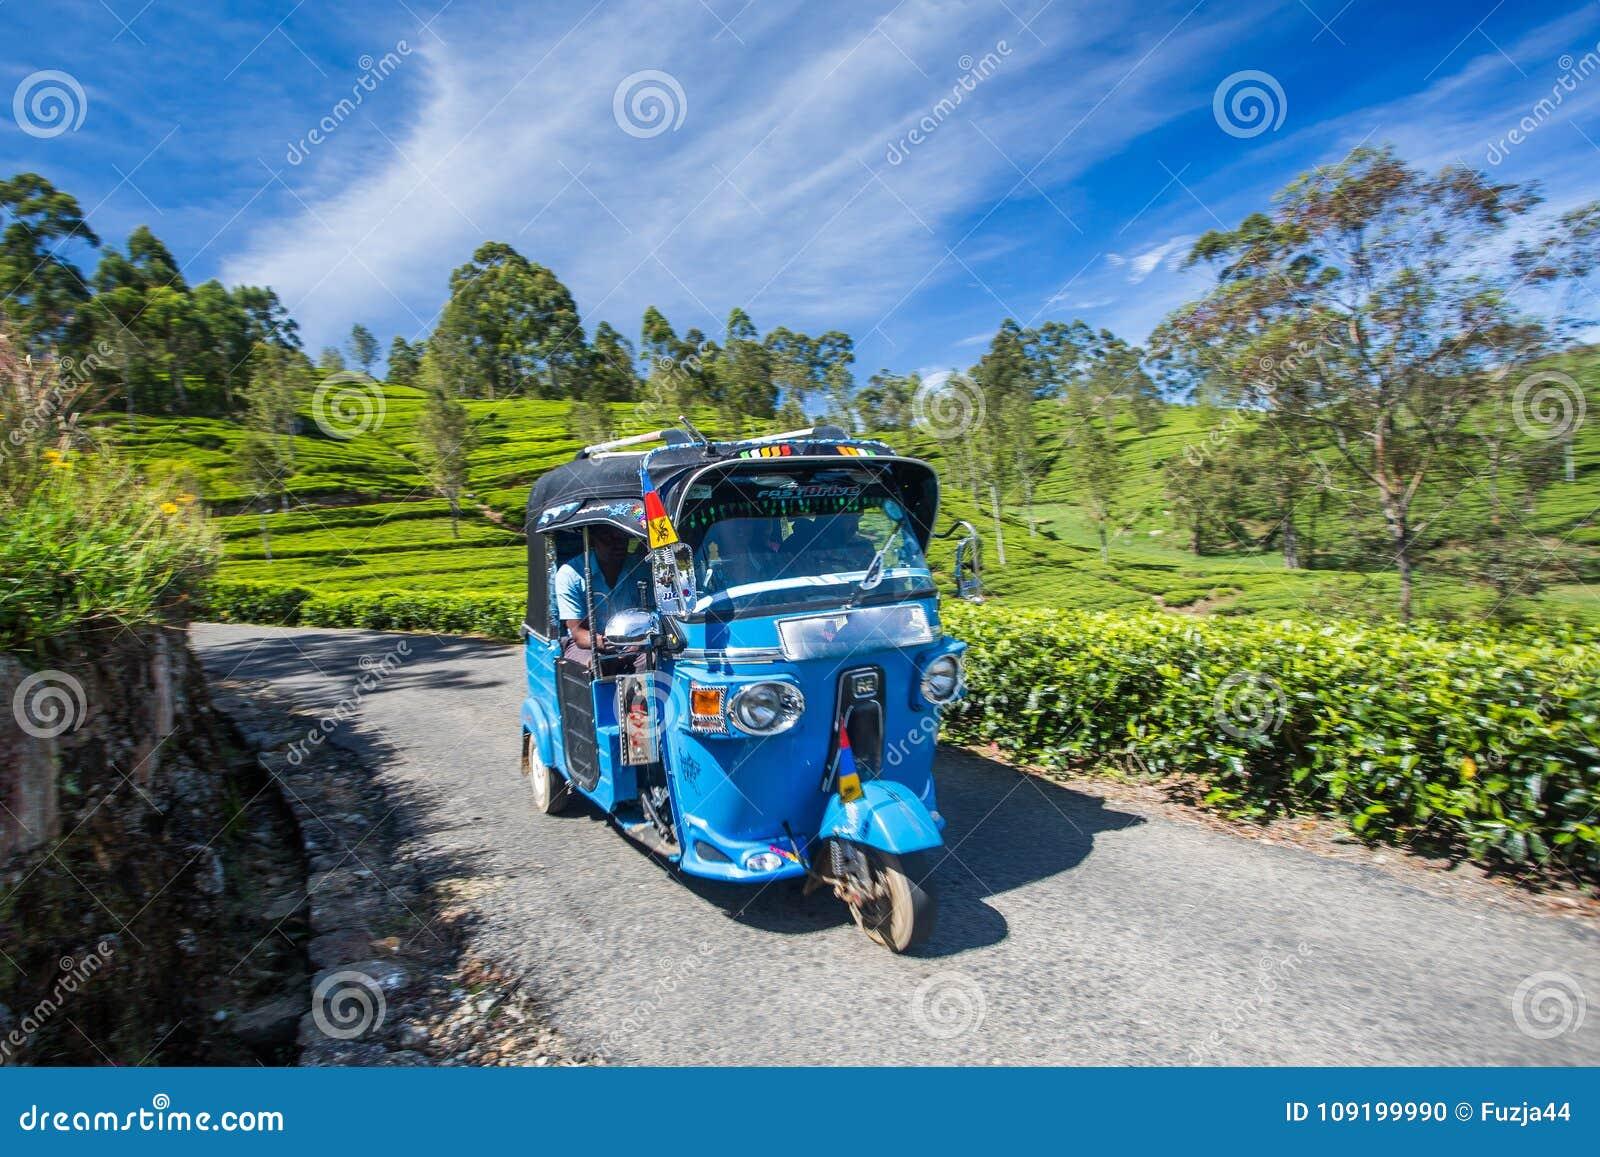 Tuk Tuk в плантациях поля чая, Шри-Ланка